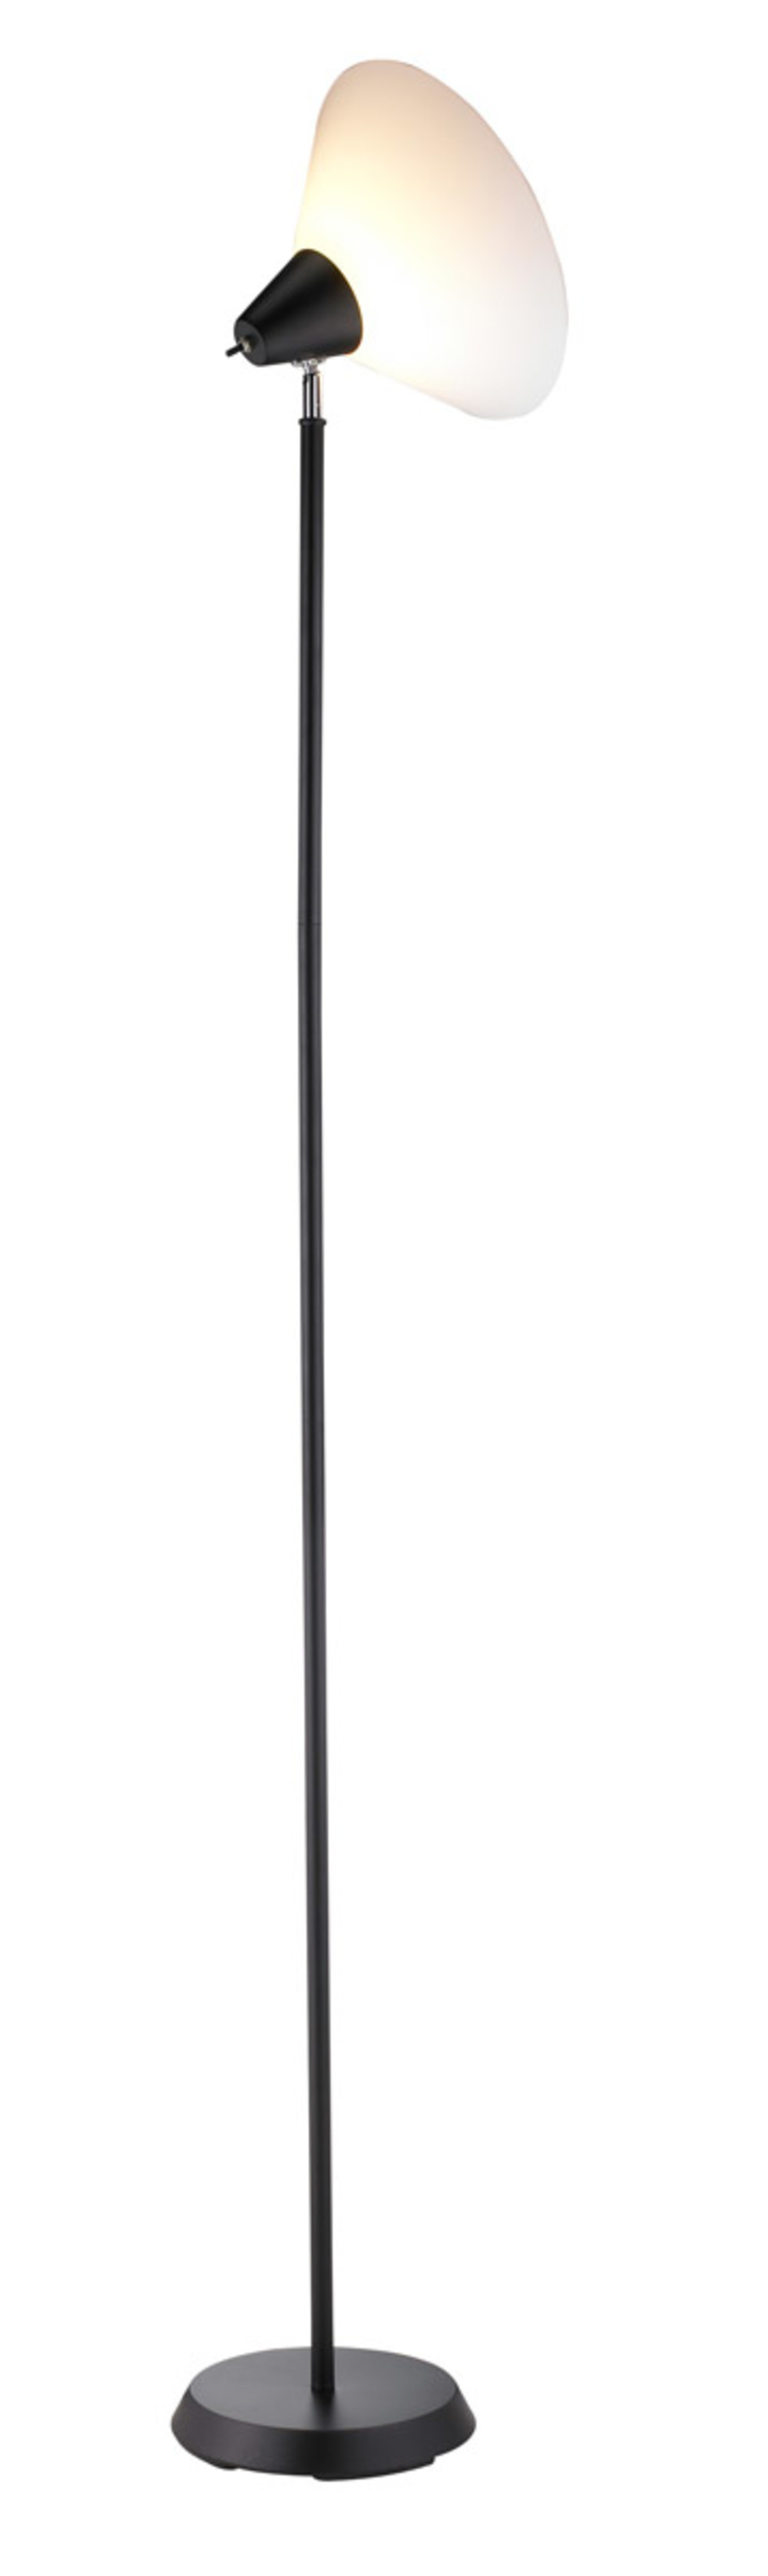 Adesso - Adesso Swivel One Light Floor Lamp in Black